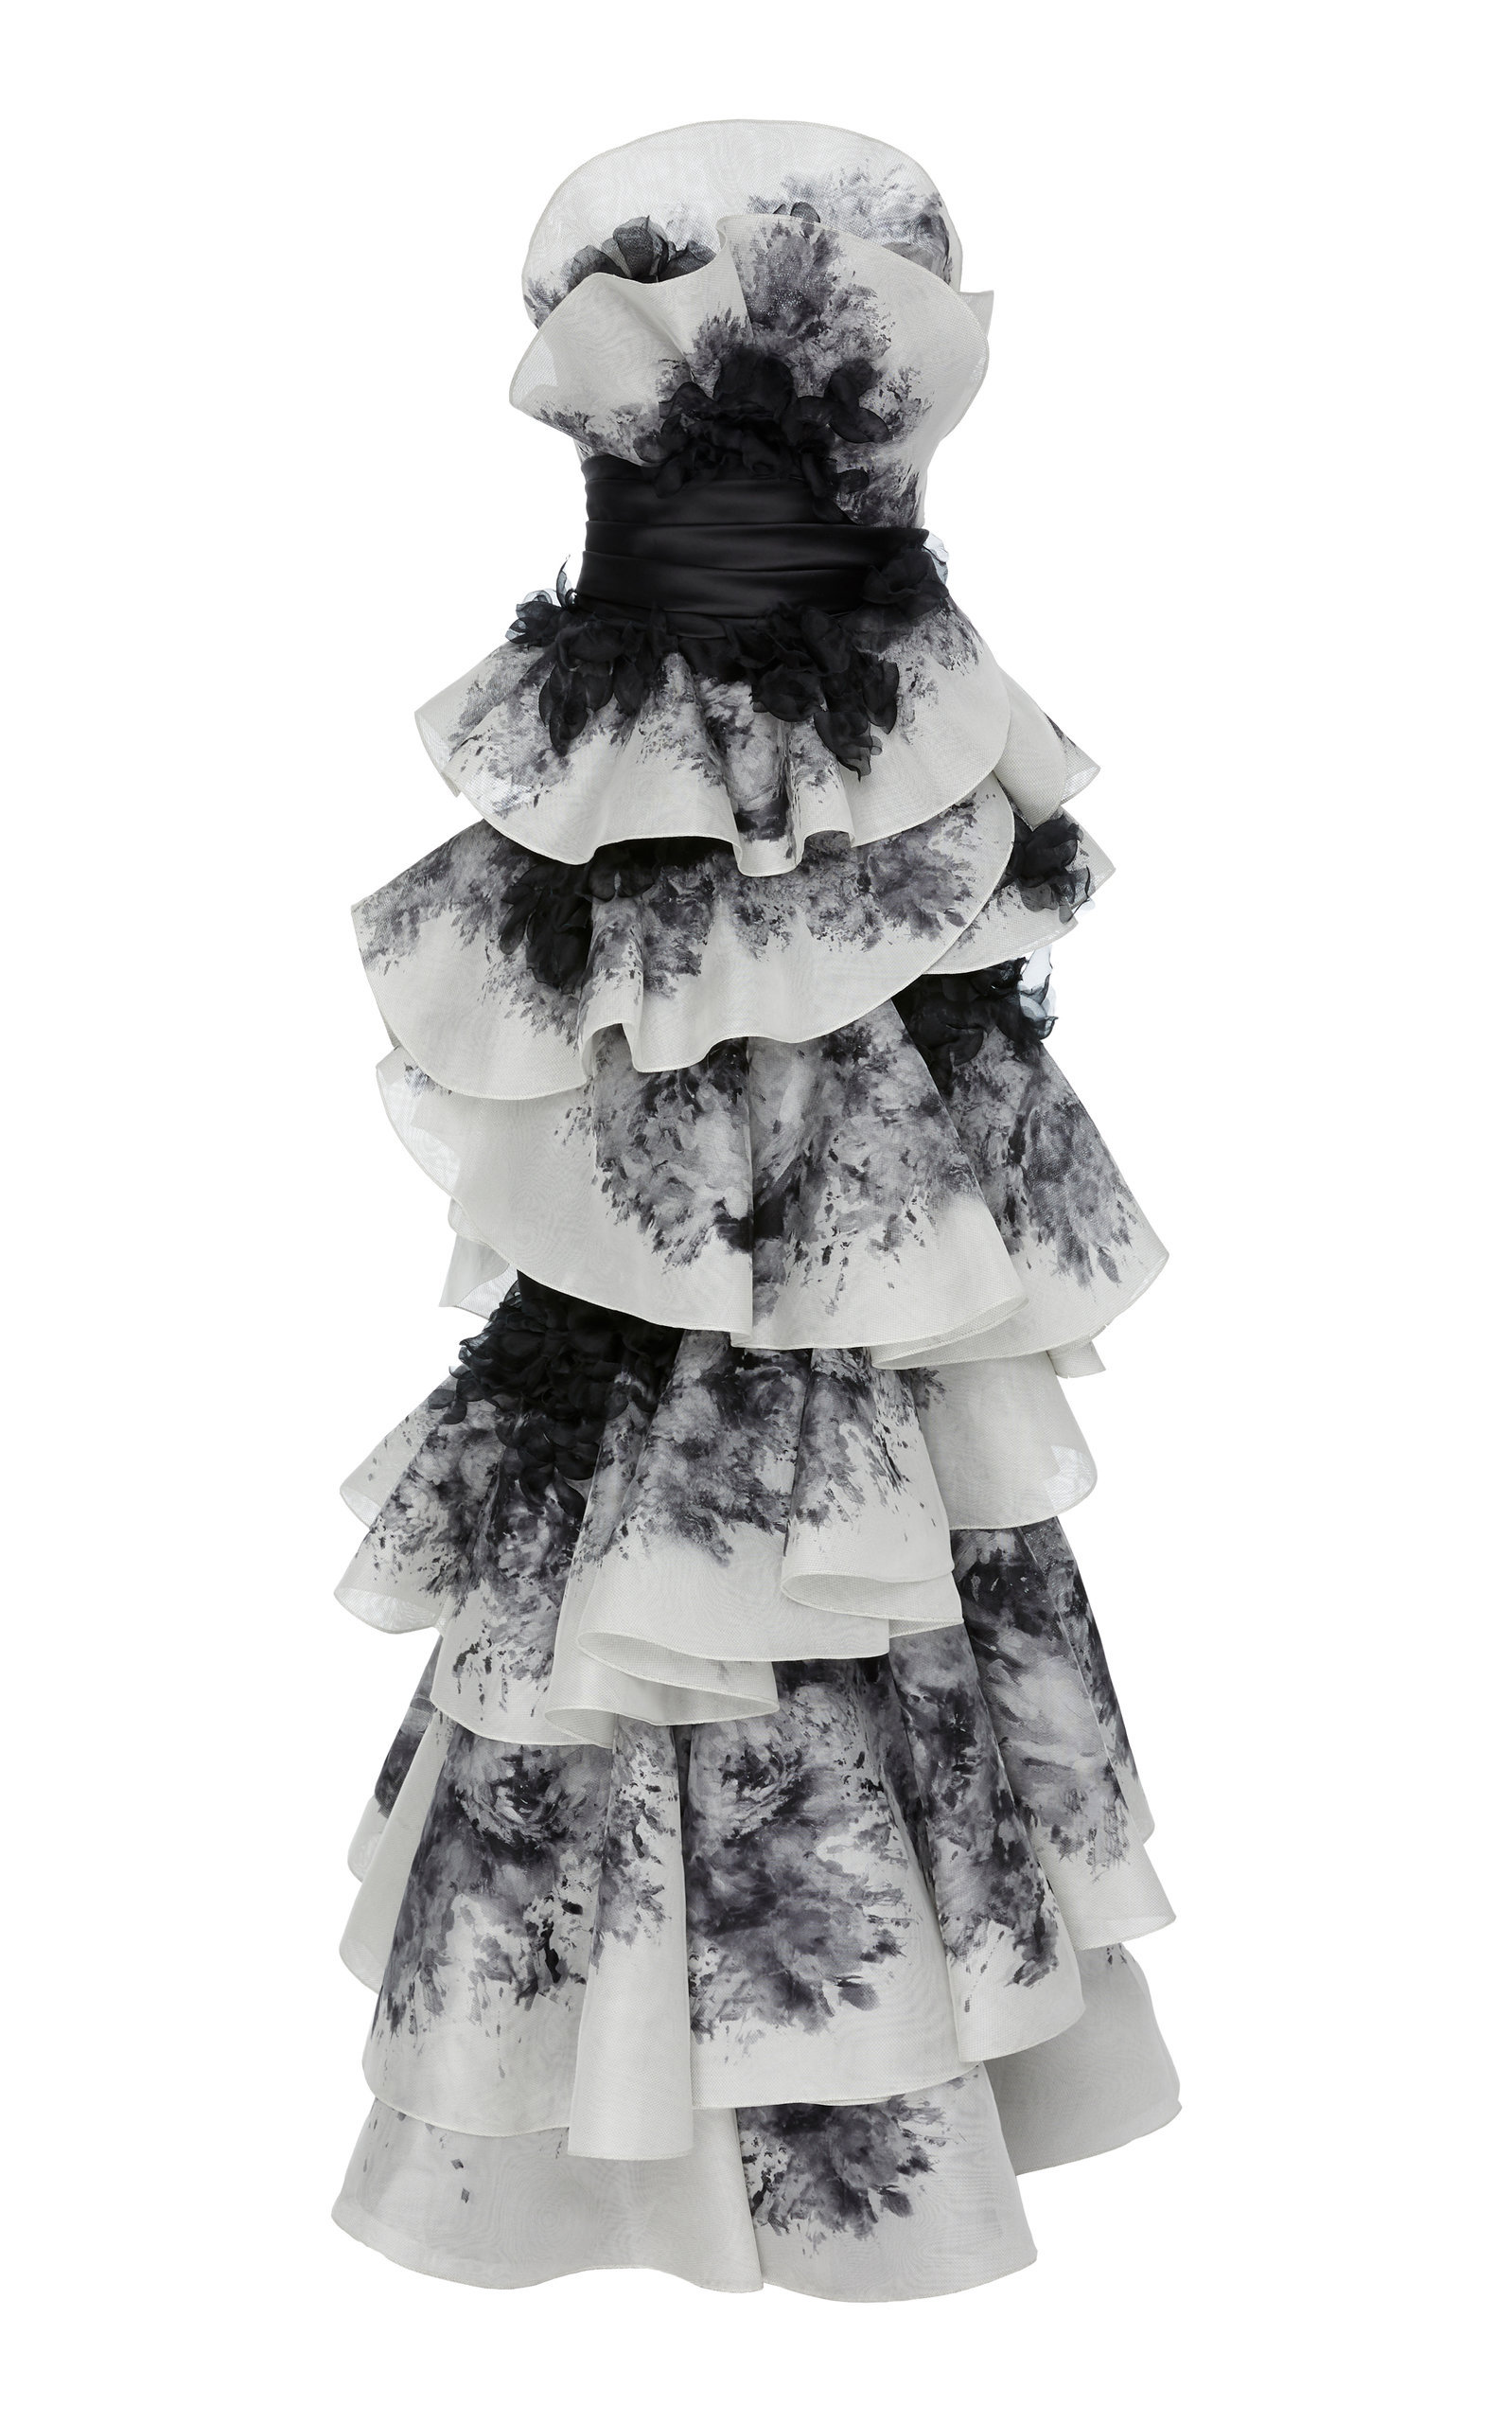 Nintai: Origami-Inspired Geometric Dresses | strictlypaper | 2560x1598